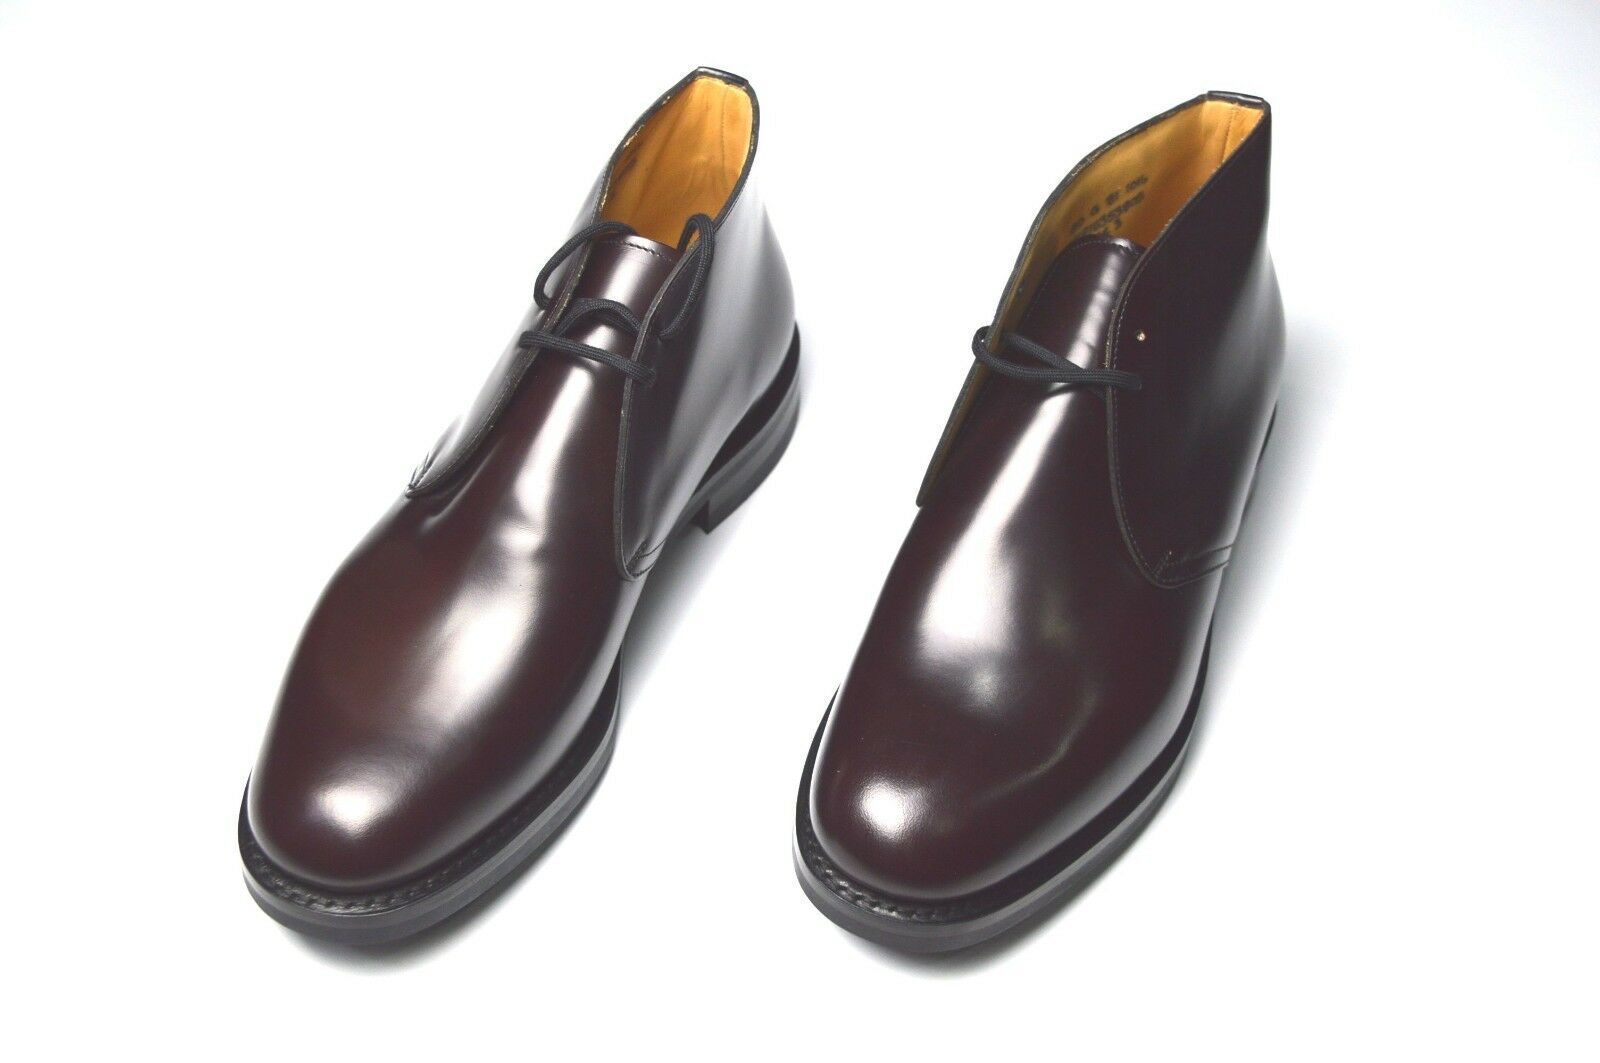 NEW CHURCH'S Dress Leather scarpe Ankle stivali  Dimensione Eu 42 Uk 8 Us 9 (H9)